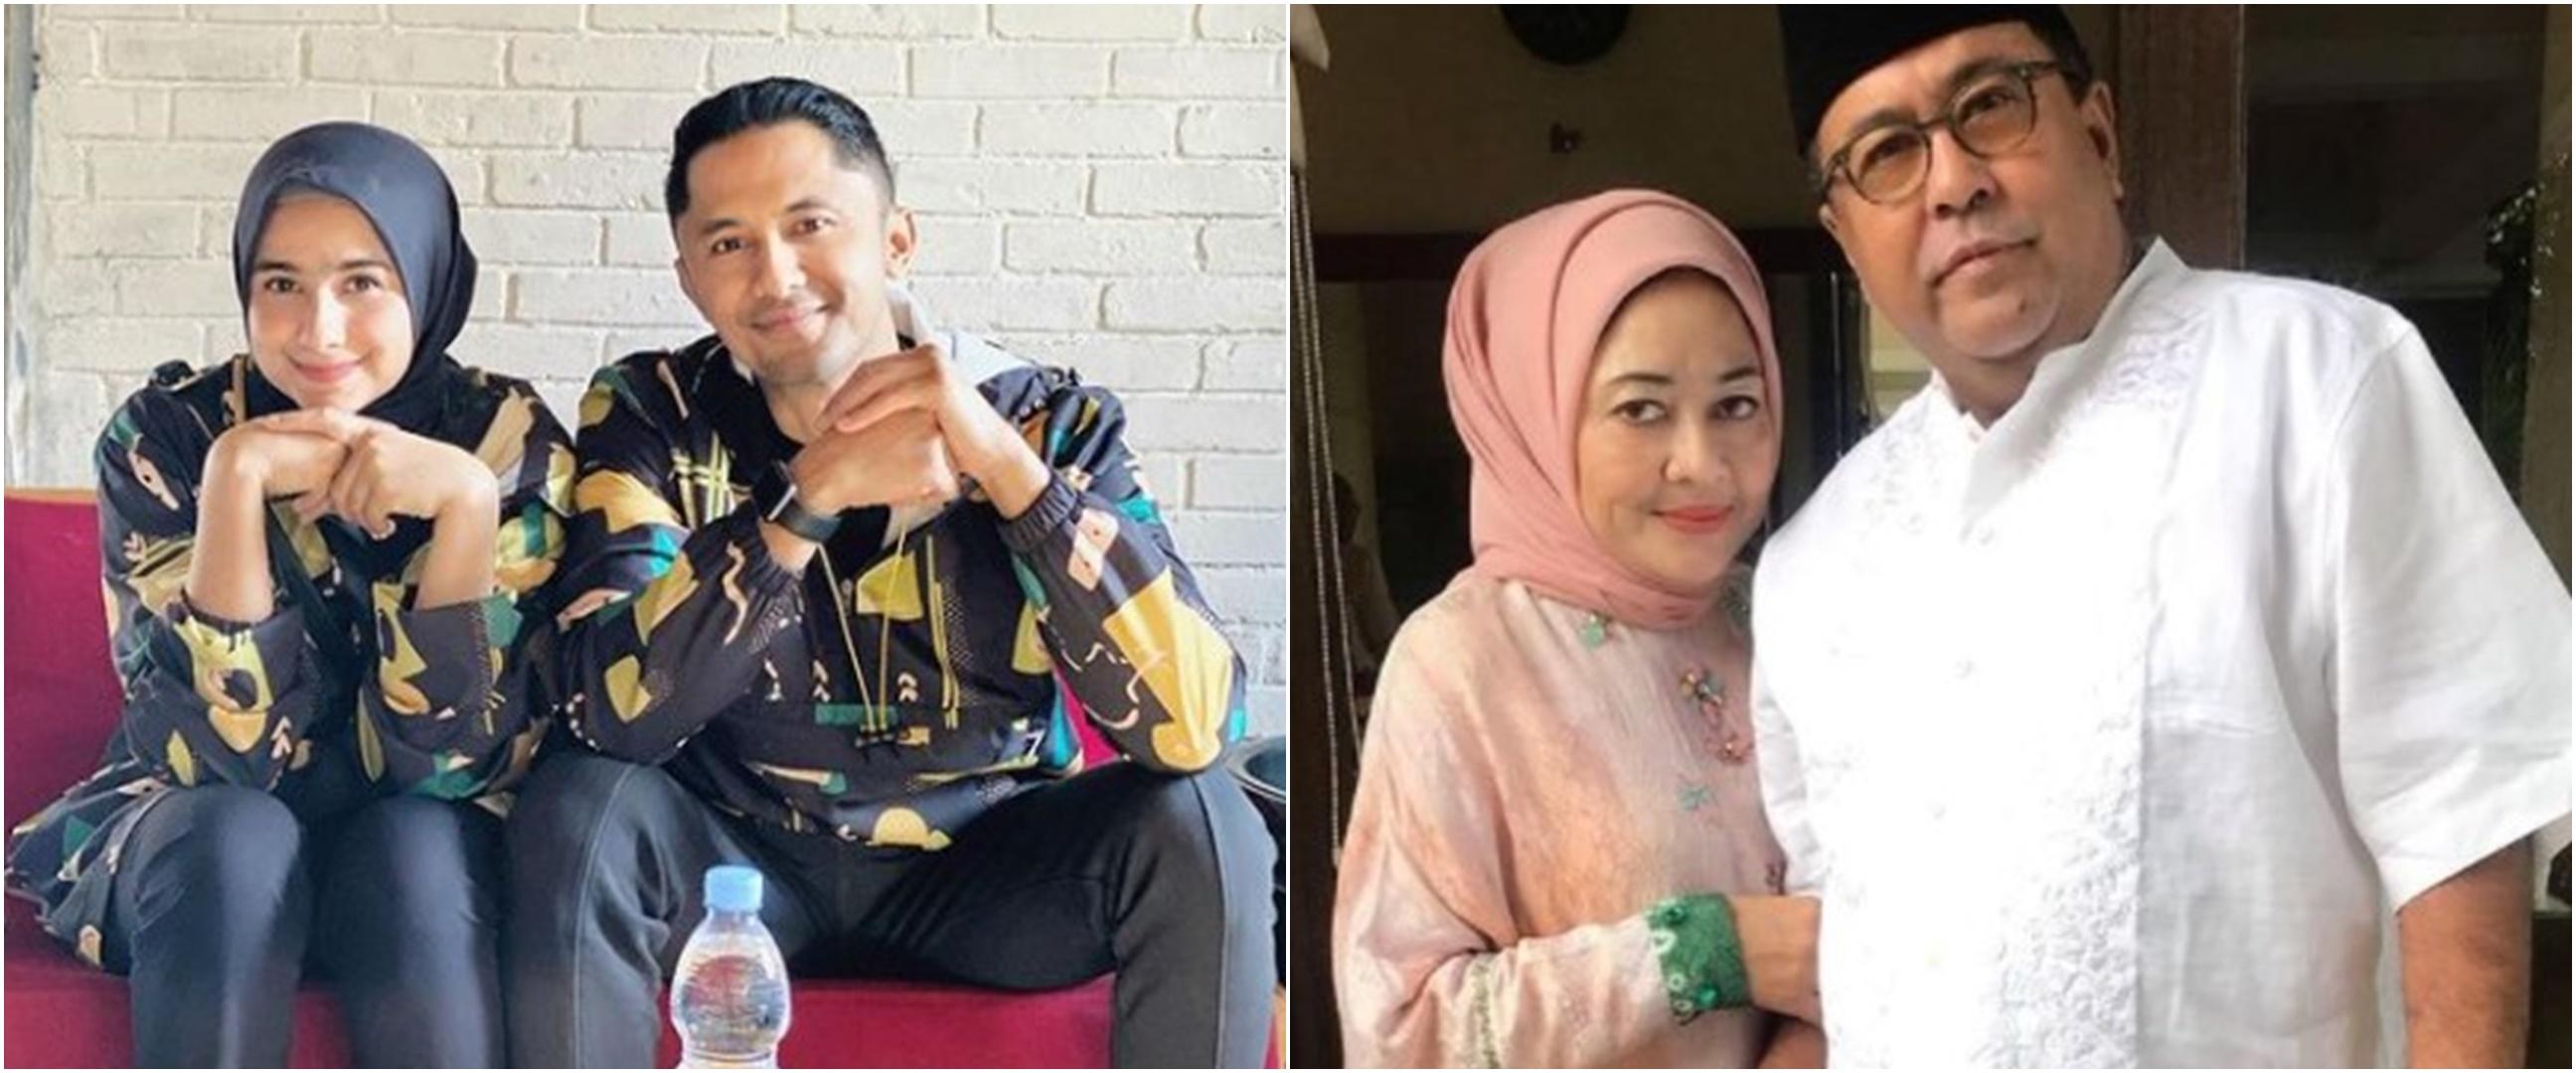 Potret tanpa makeup 6 istri politikus seleb, cantik natural